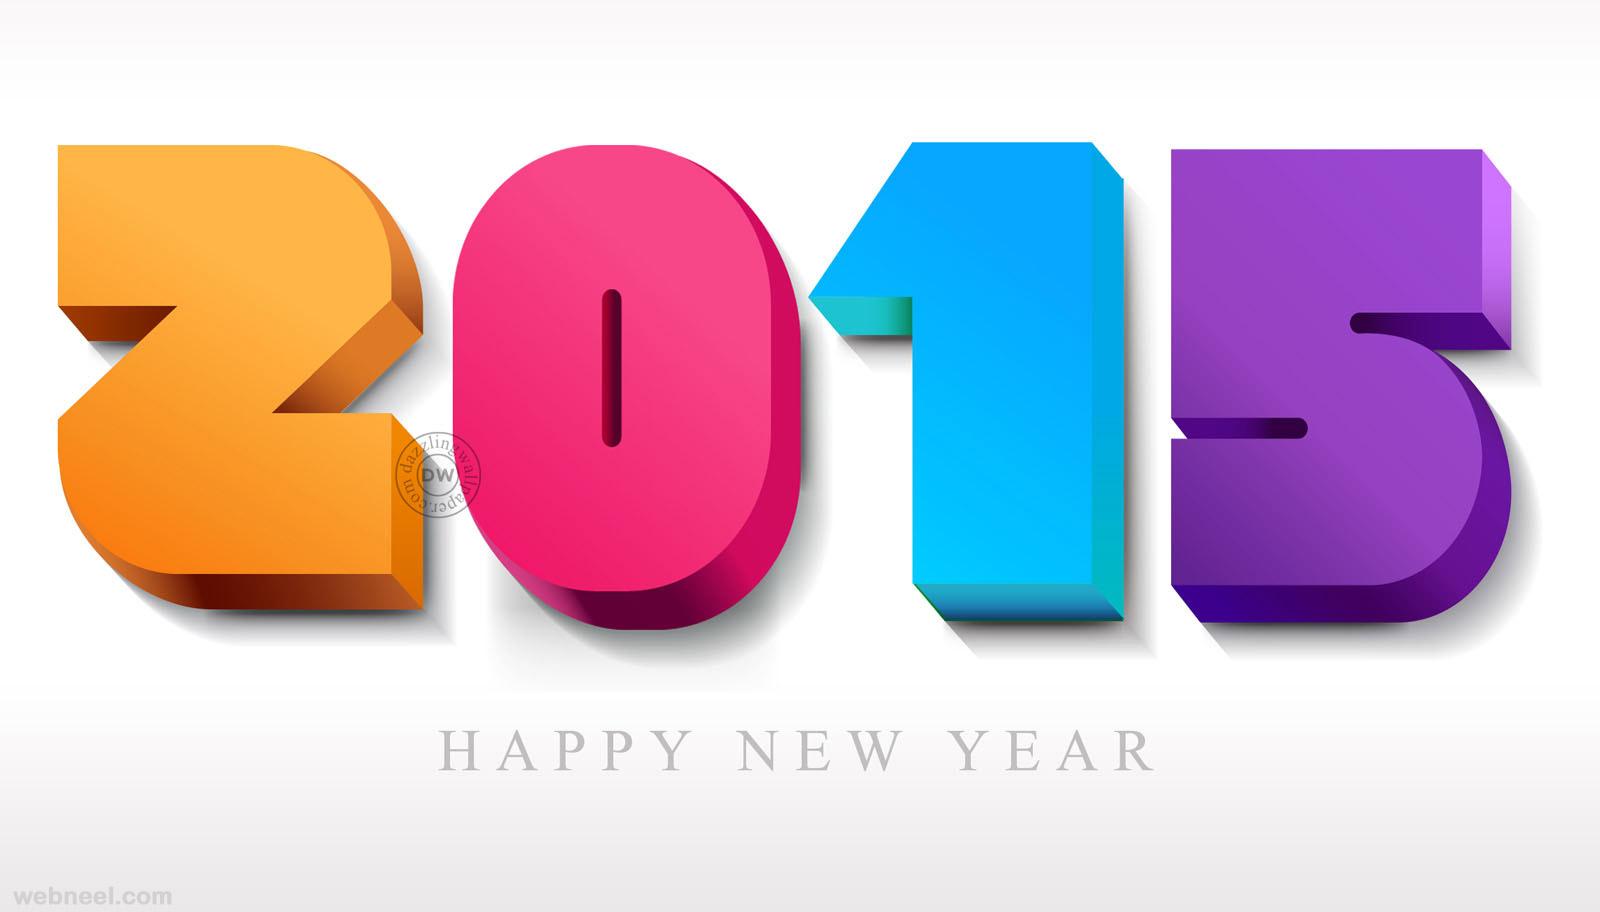 New Year Greeting Card 2015 13